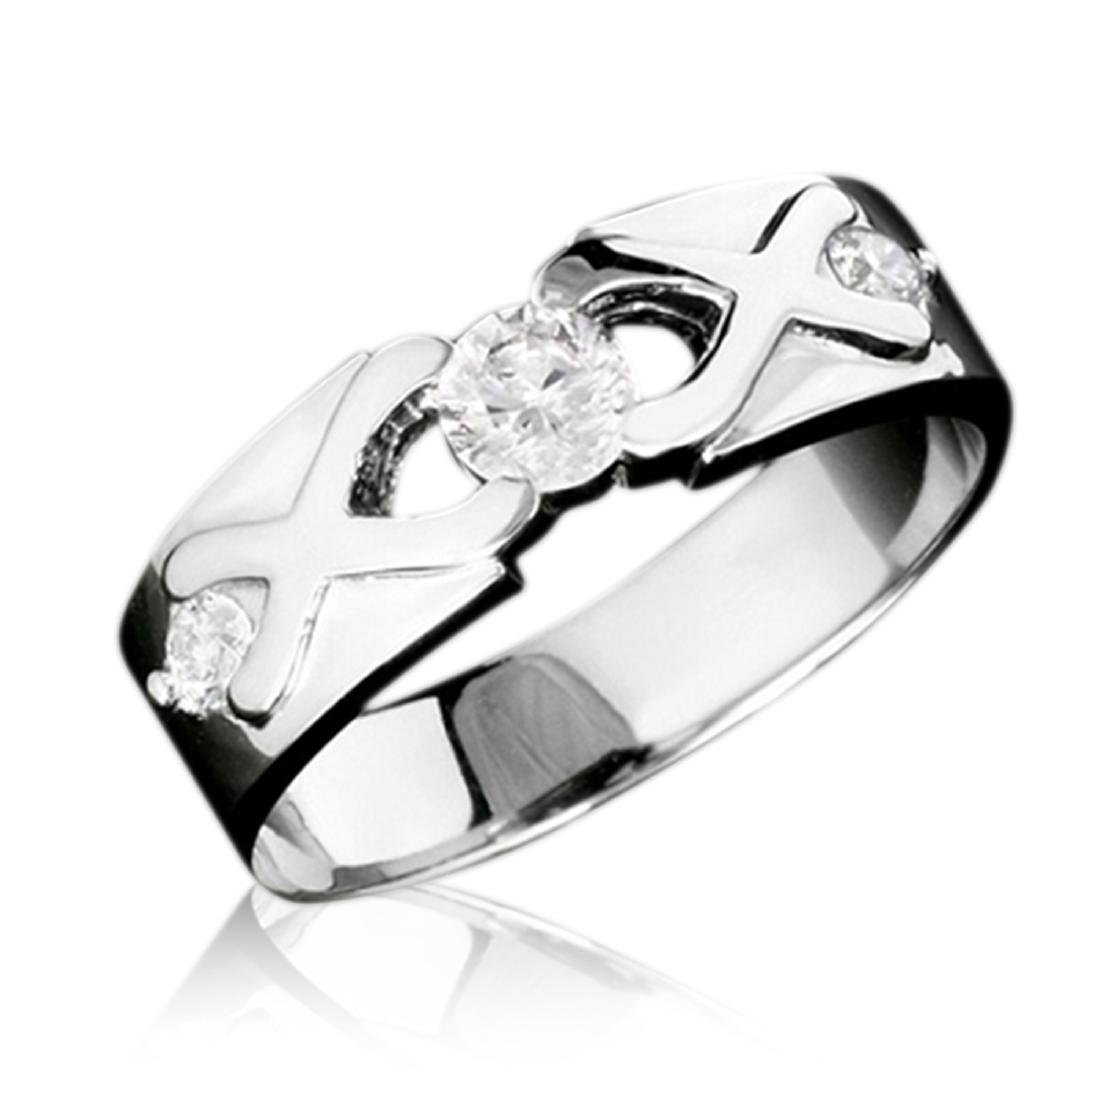 Mens 0.48 Carat Natural Diamond 18K Solid White Gold